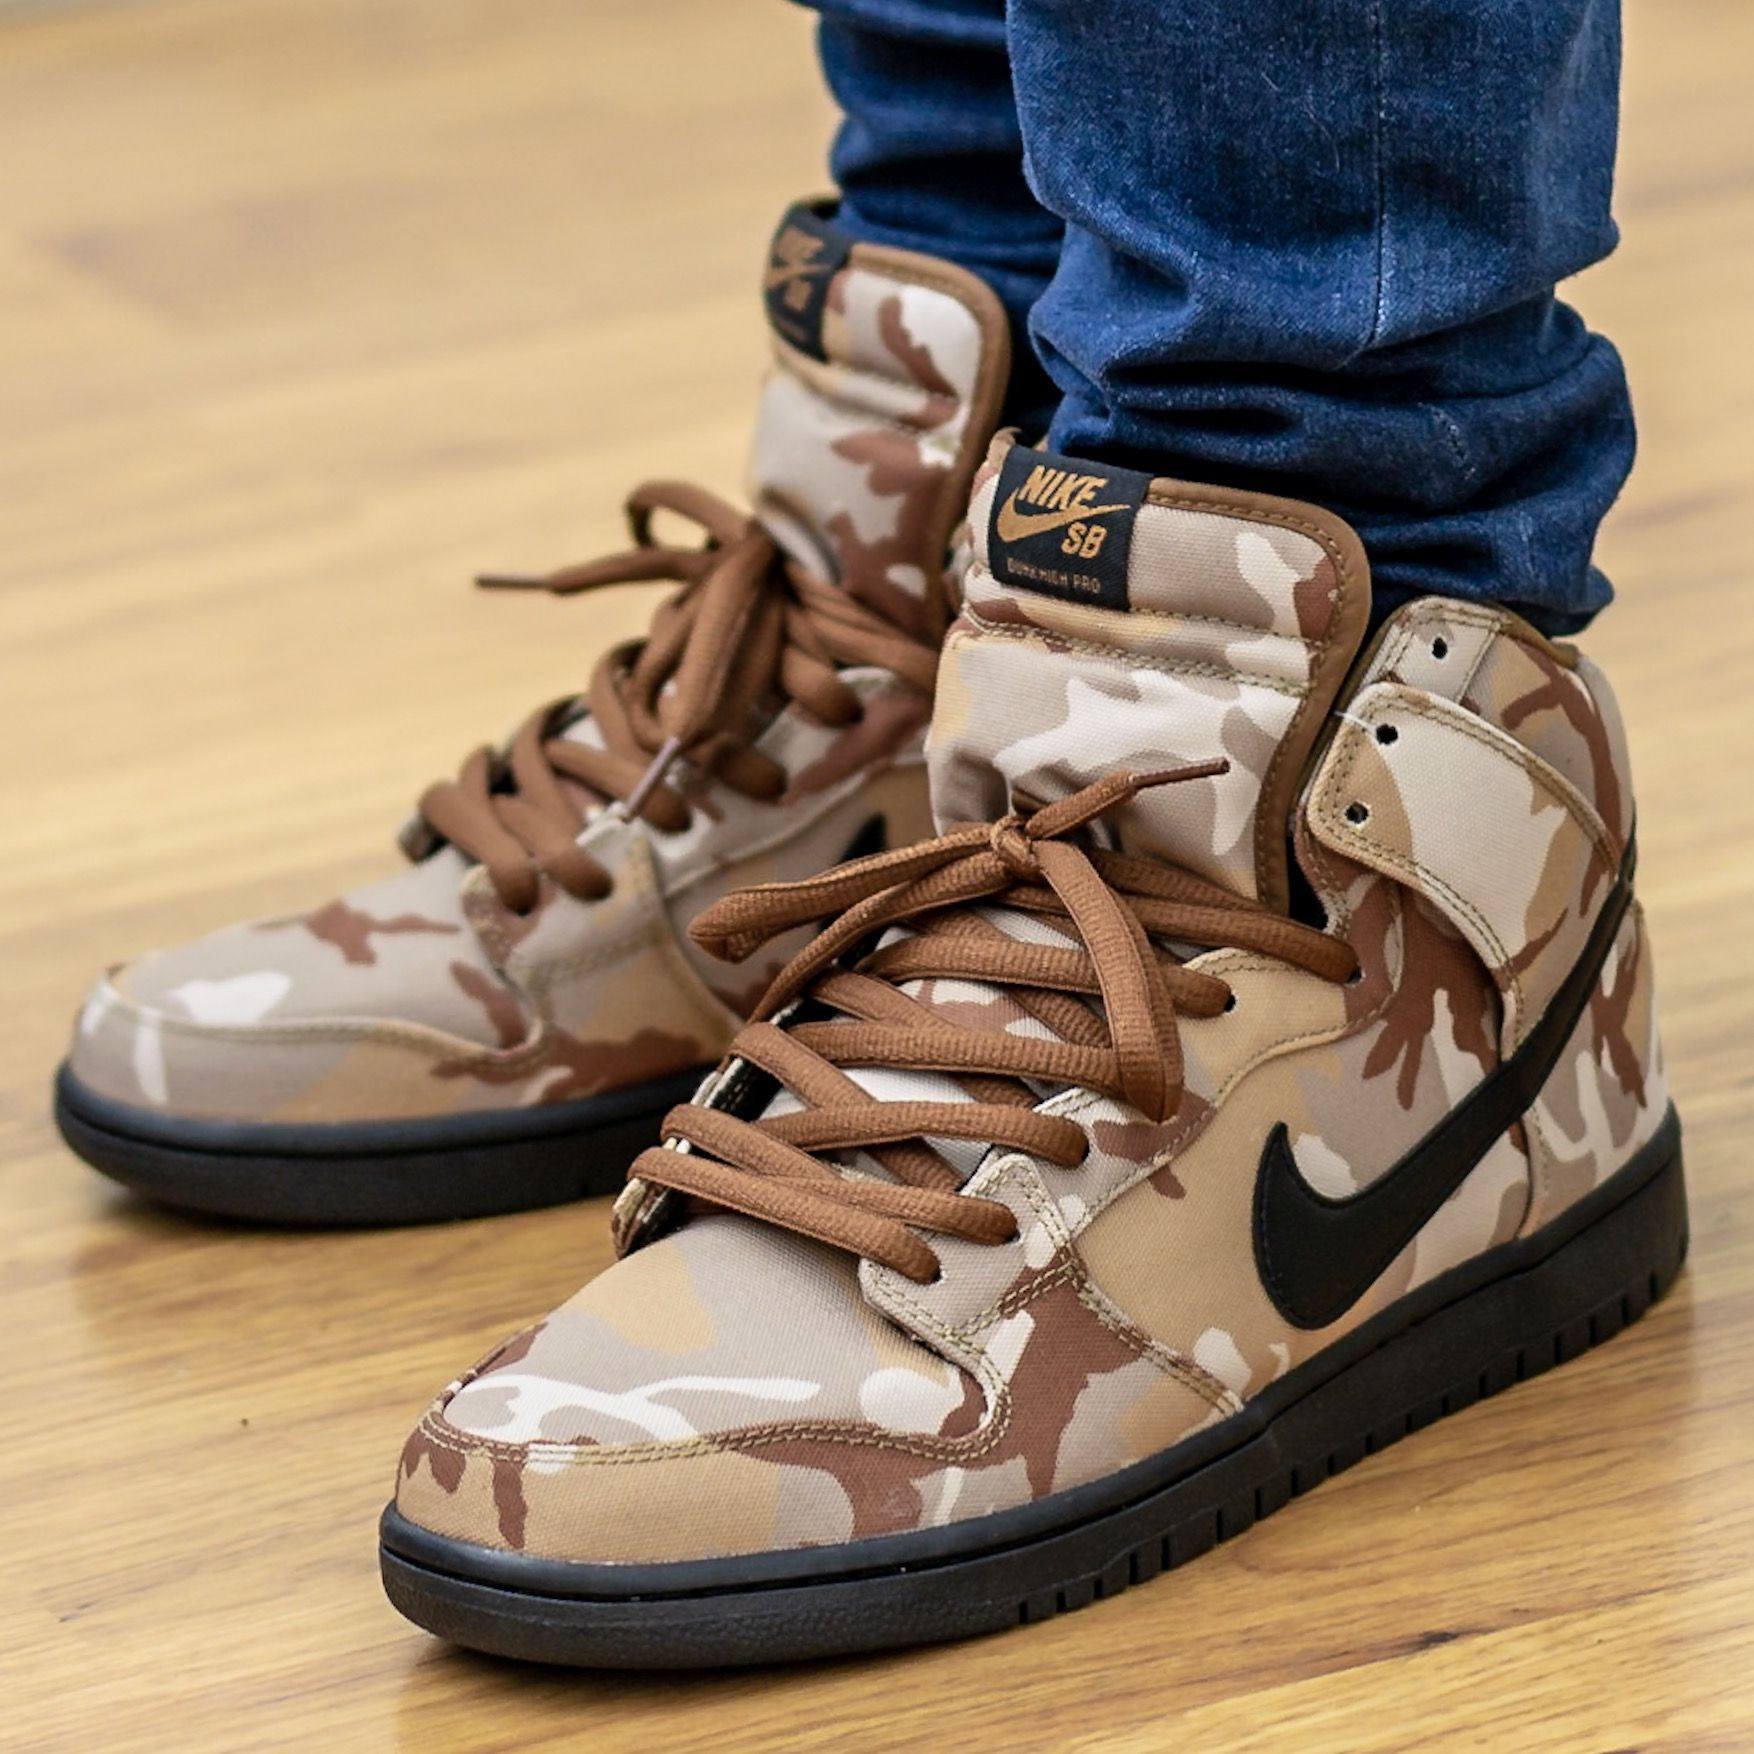 Nike SB Dunk High Pro Desert Camo On